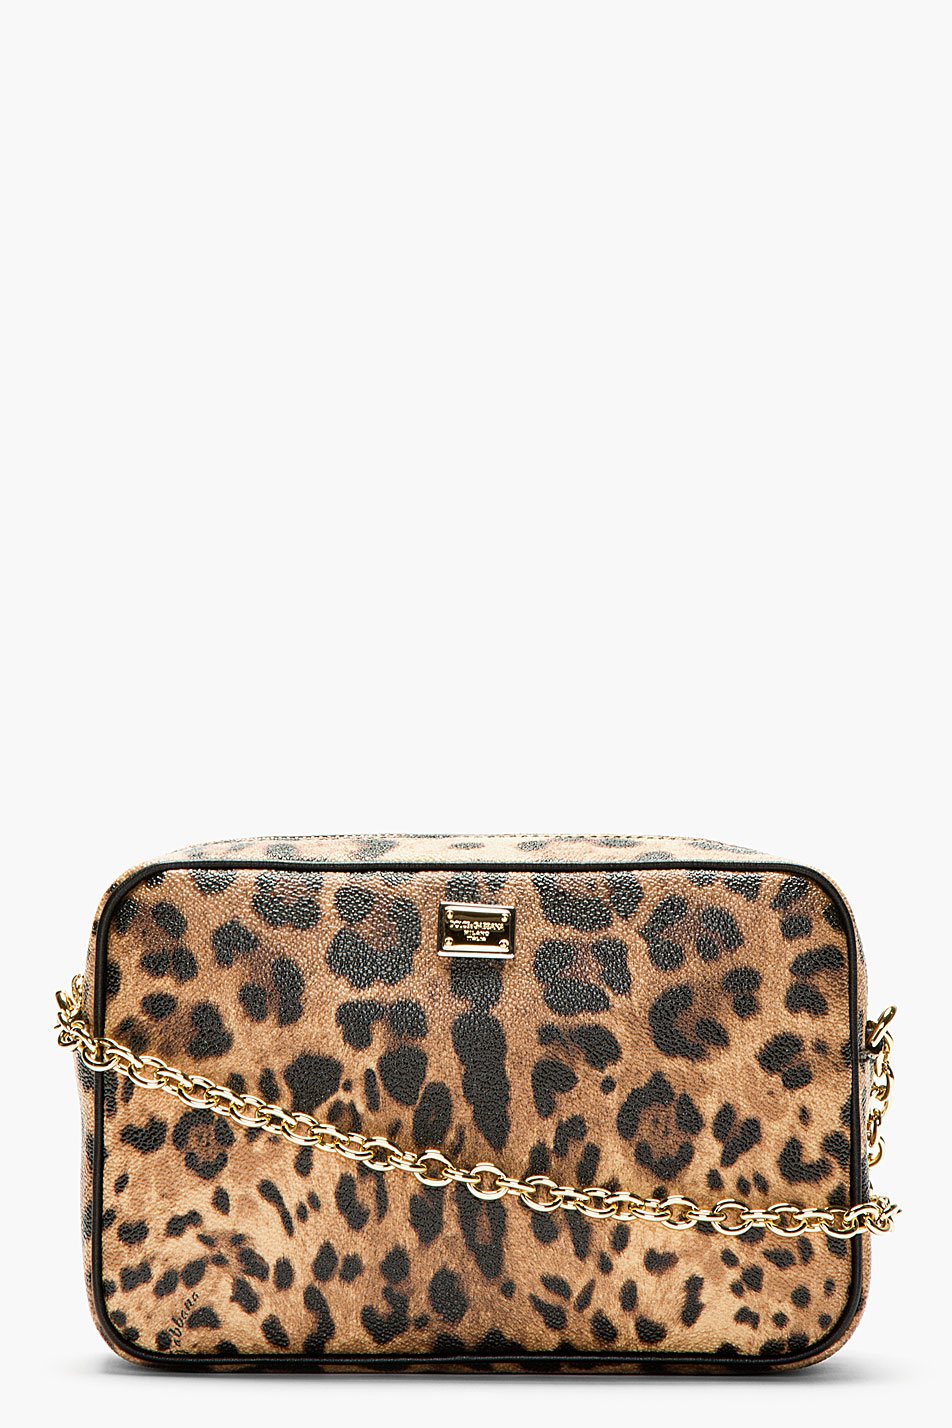 dolce  u0026 gabbana leopard print crossbody bag